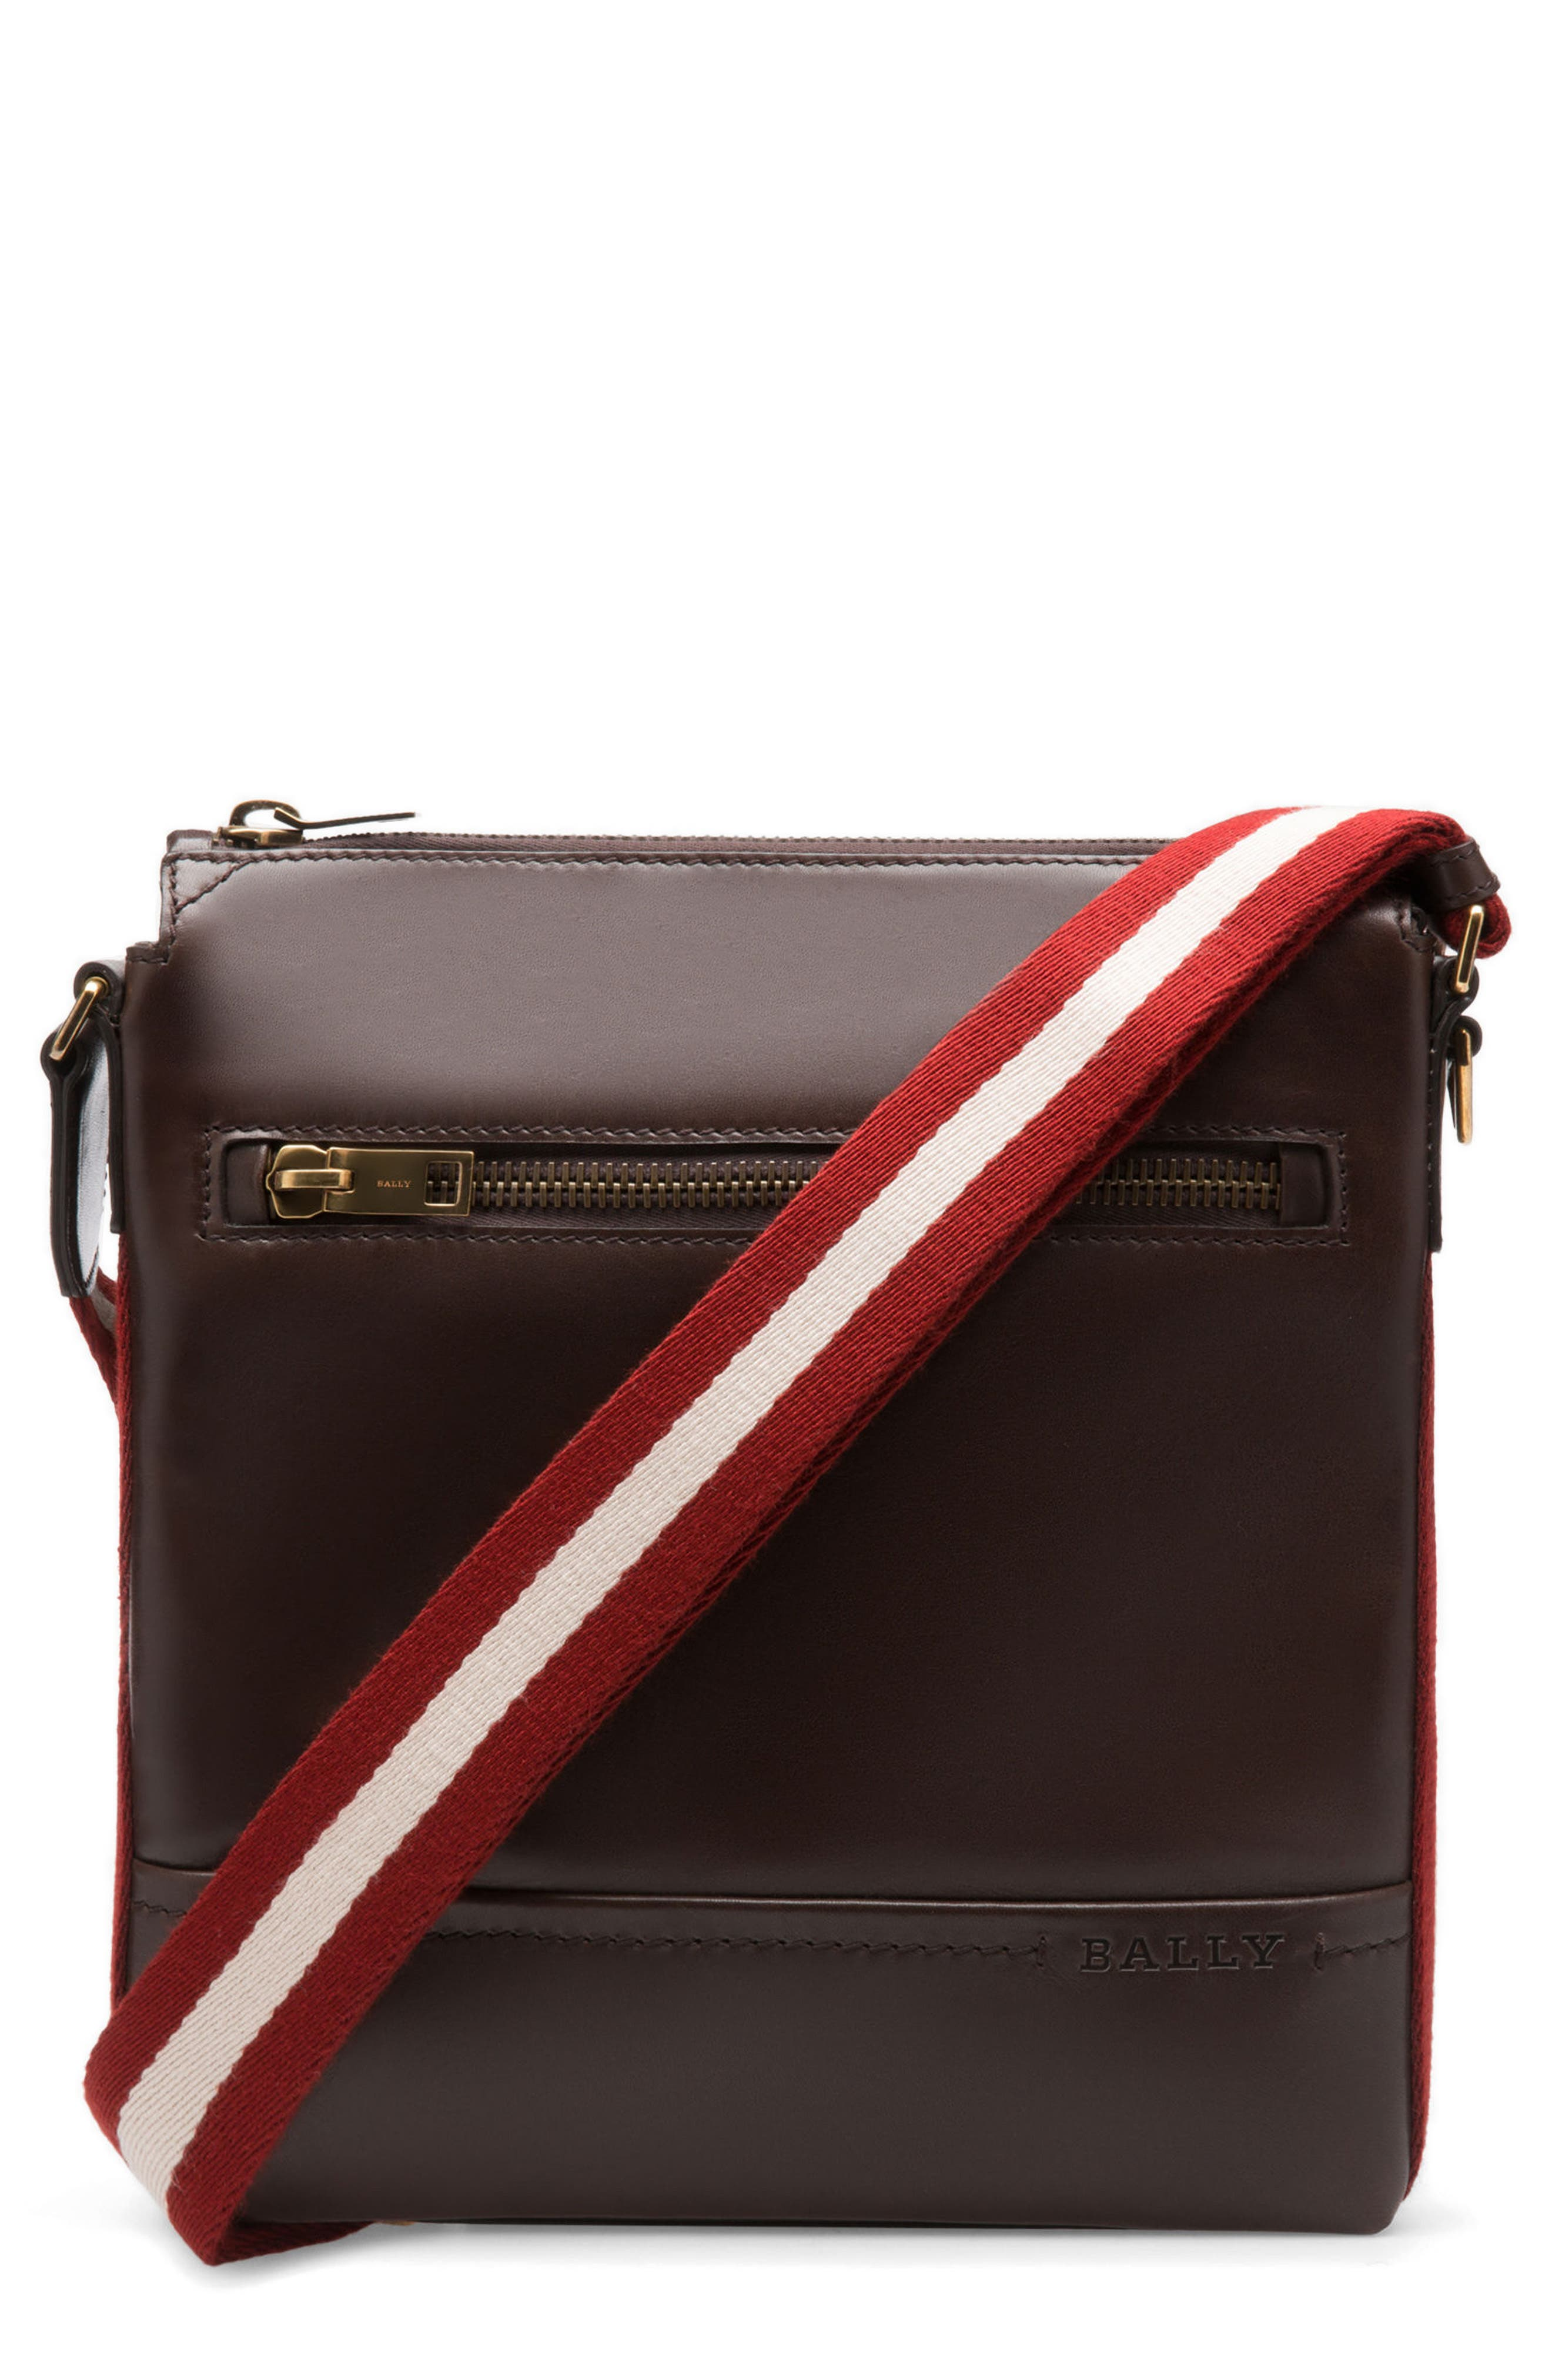 Bally Trezzini Leather Crossbody Bag